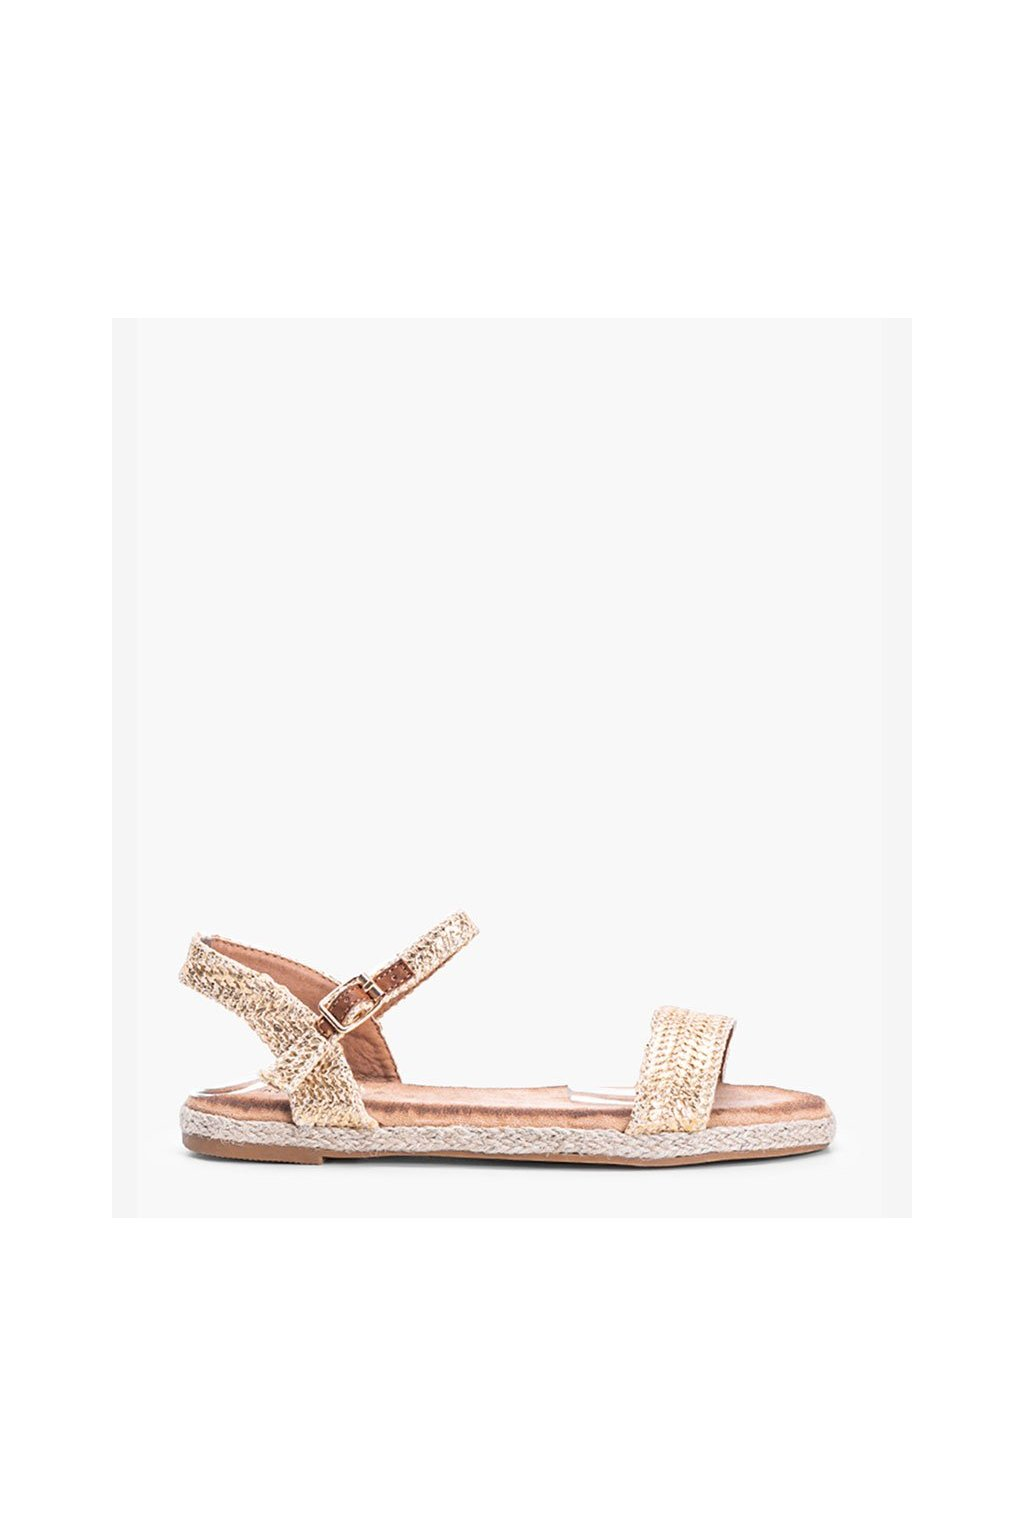 Dámske topánky sandále žlté kód L197SA-1 - GM